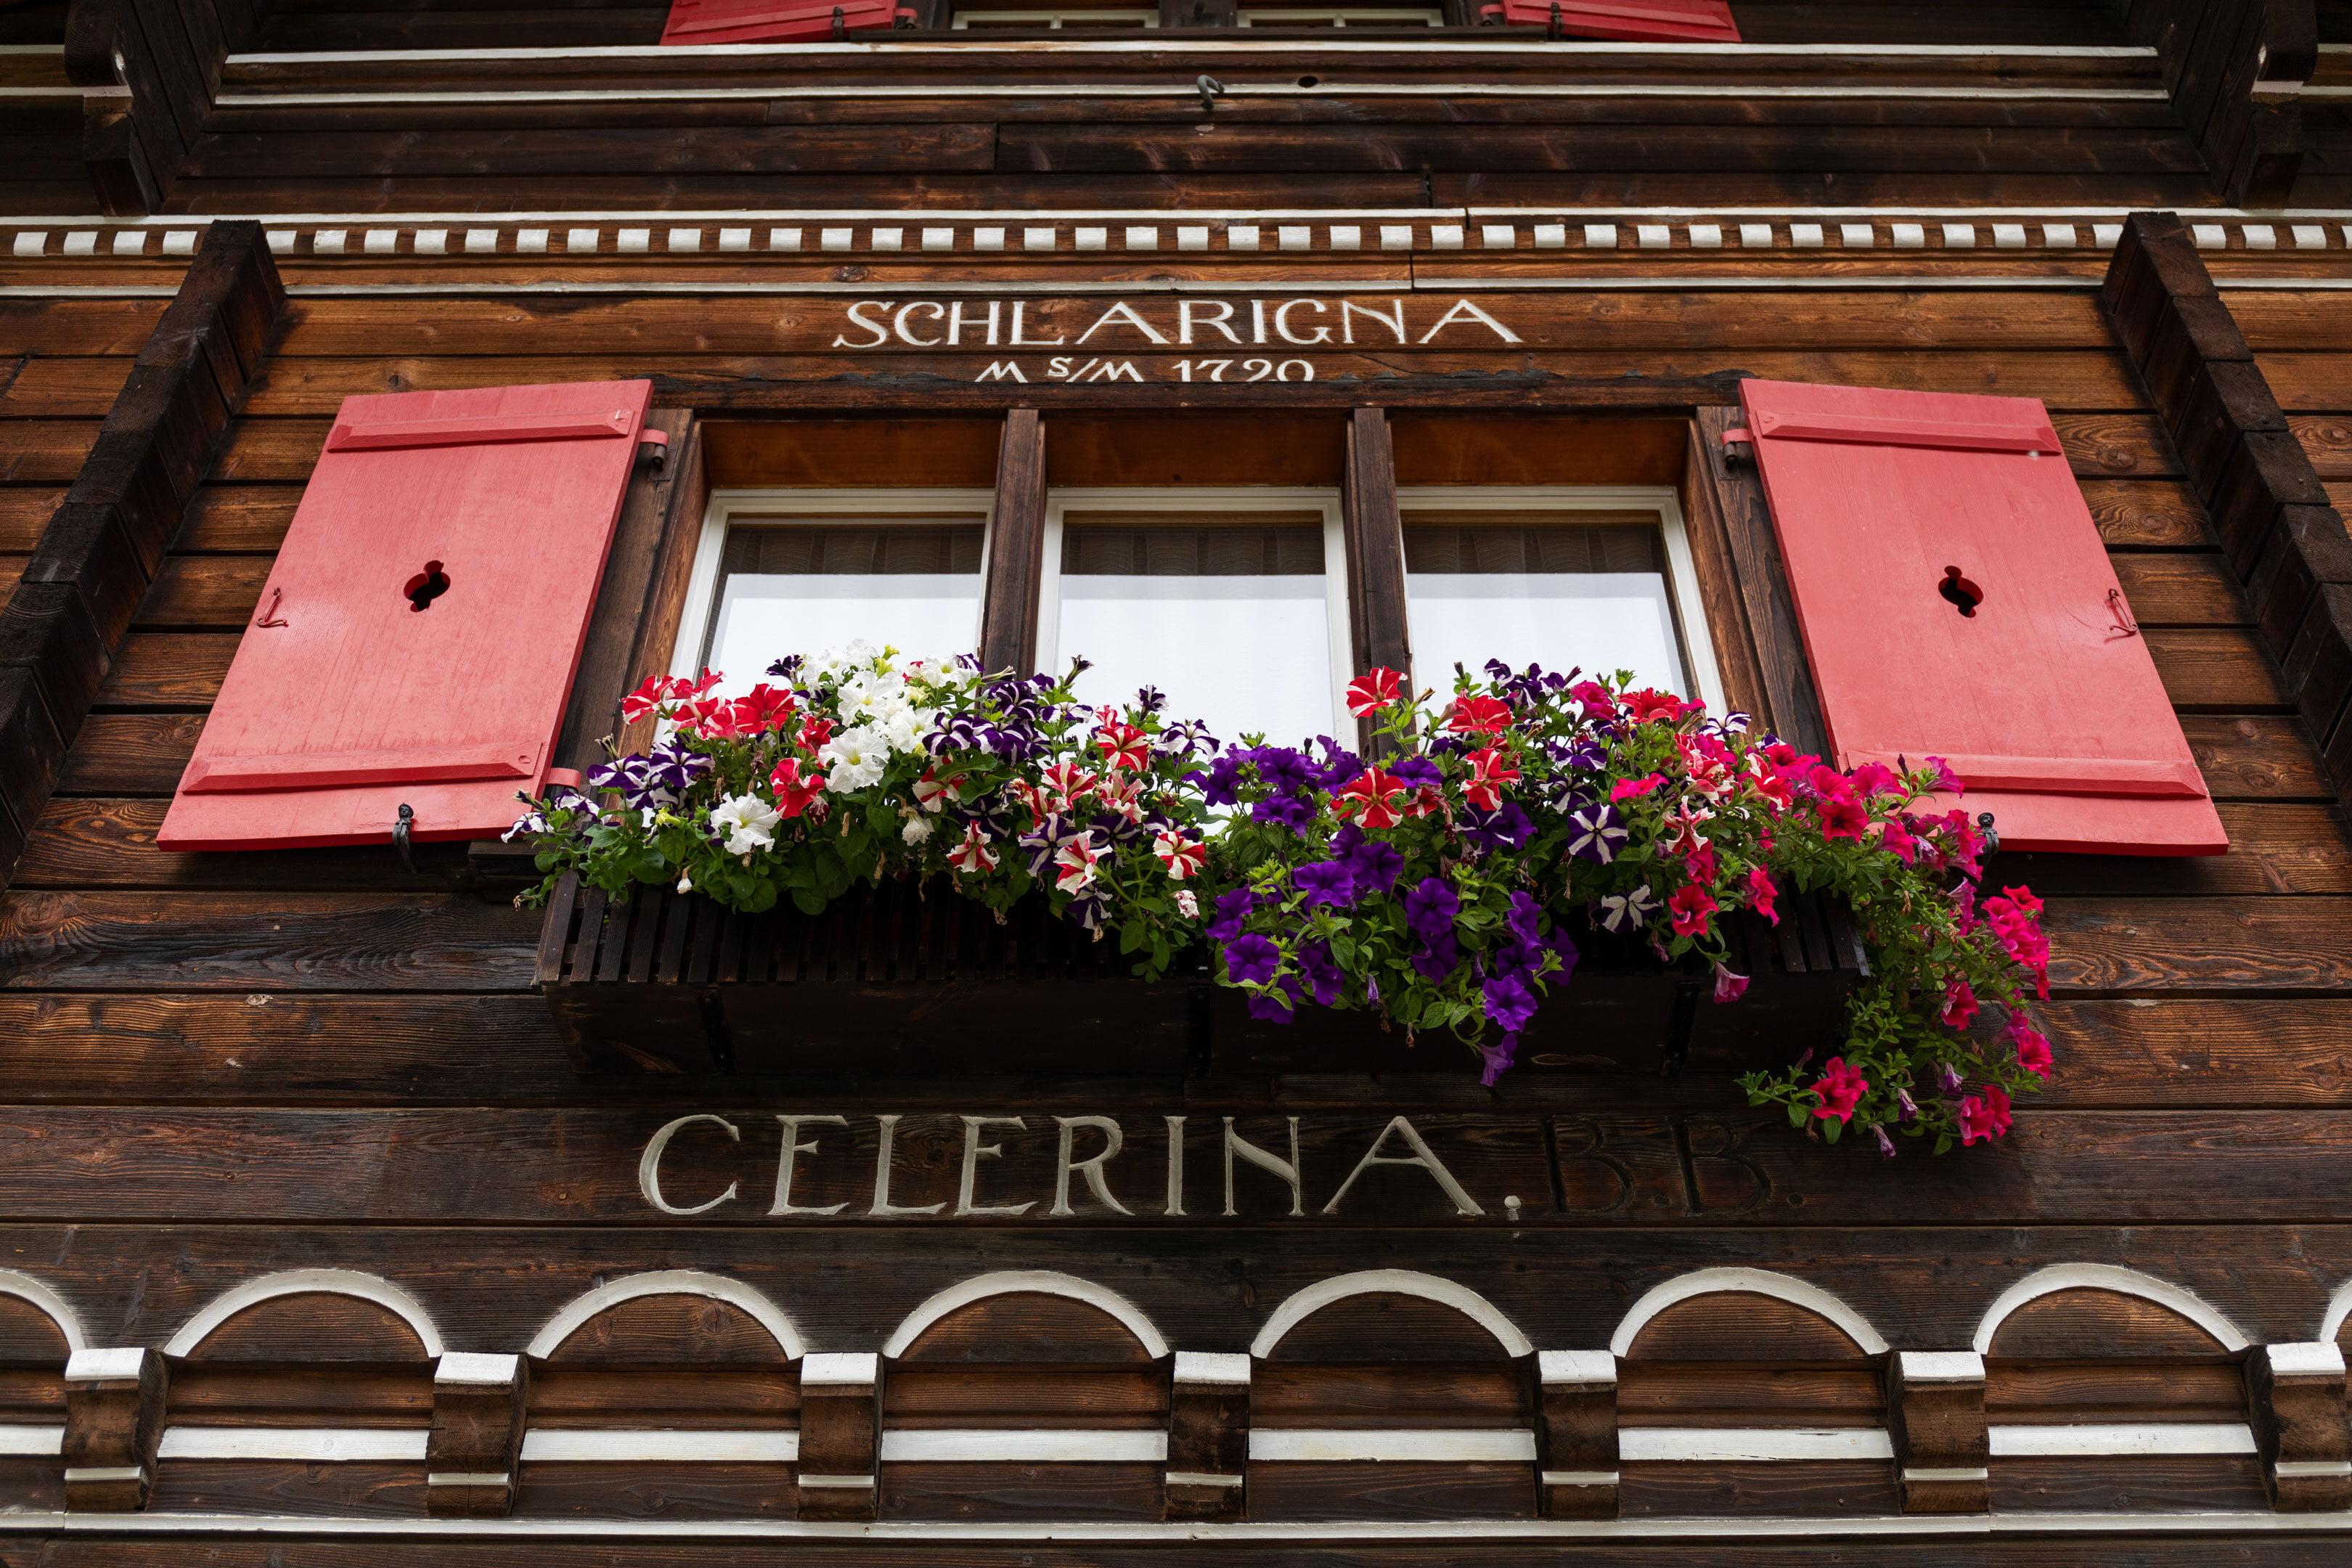 Celerina